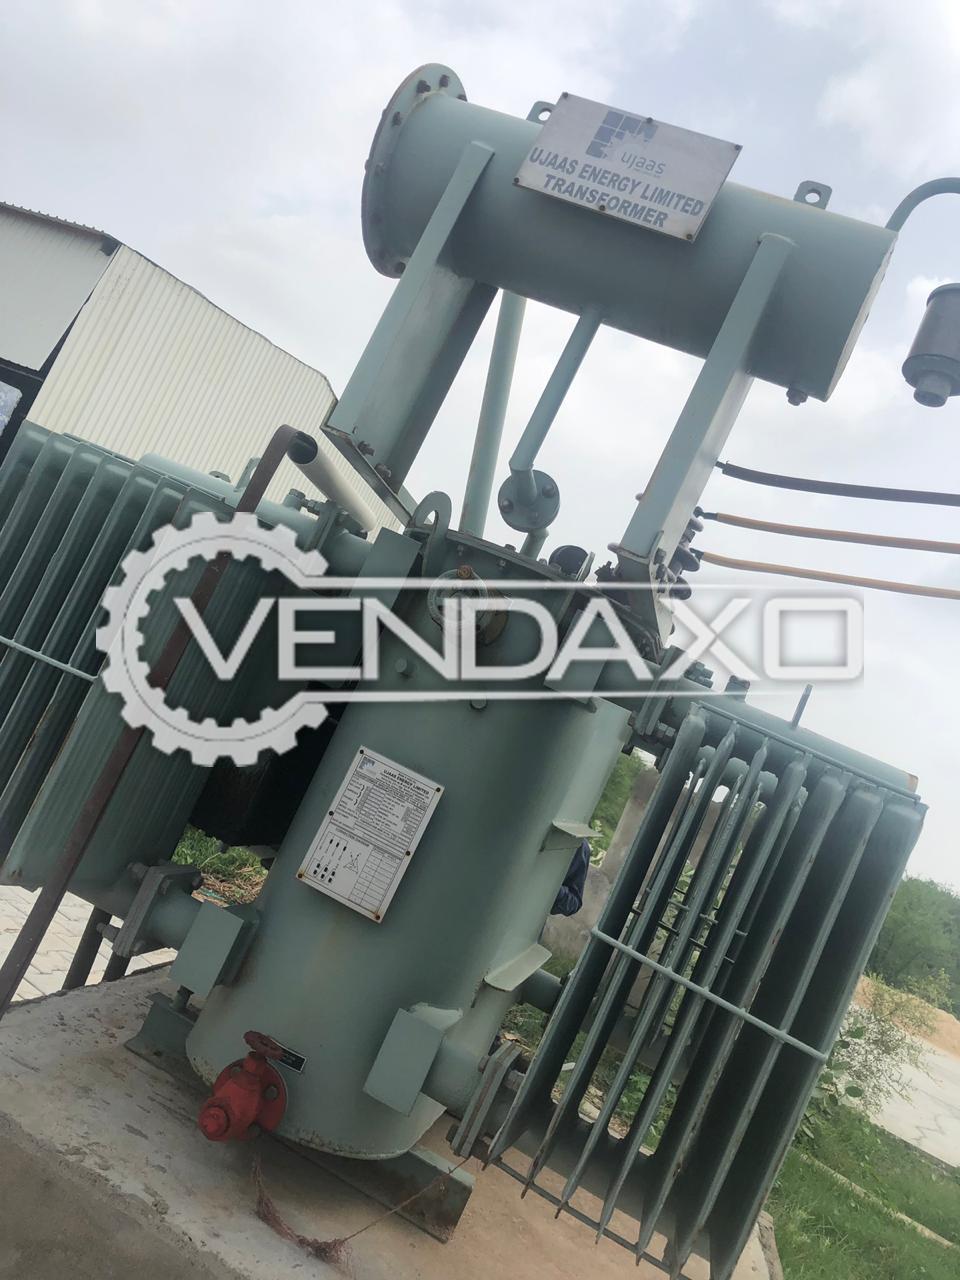 UJAAS Make Transformer - 500 Kva, 2014 Model